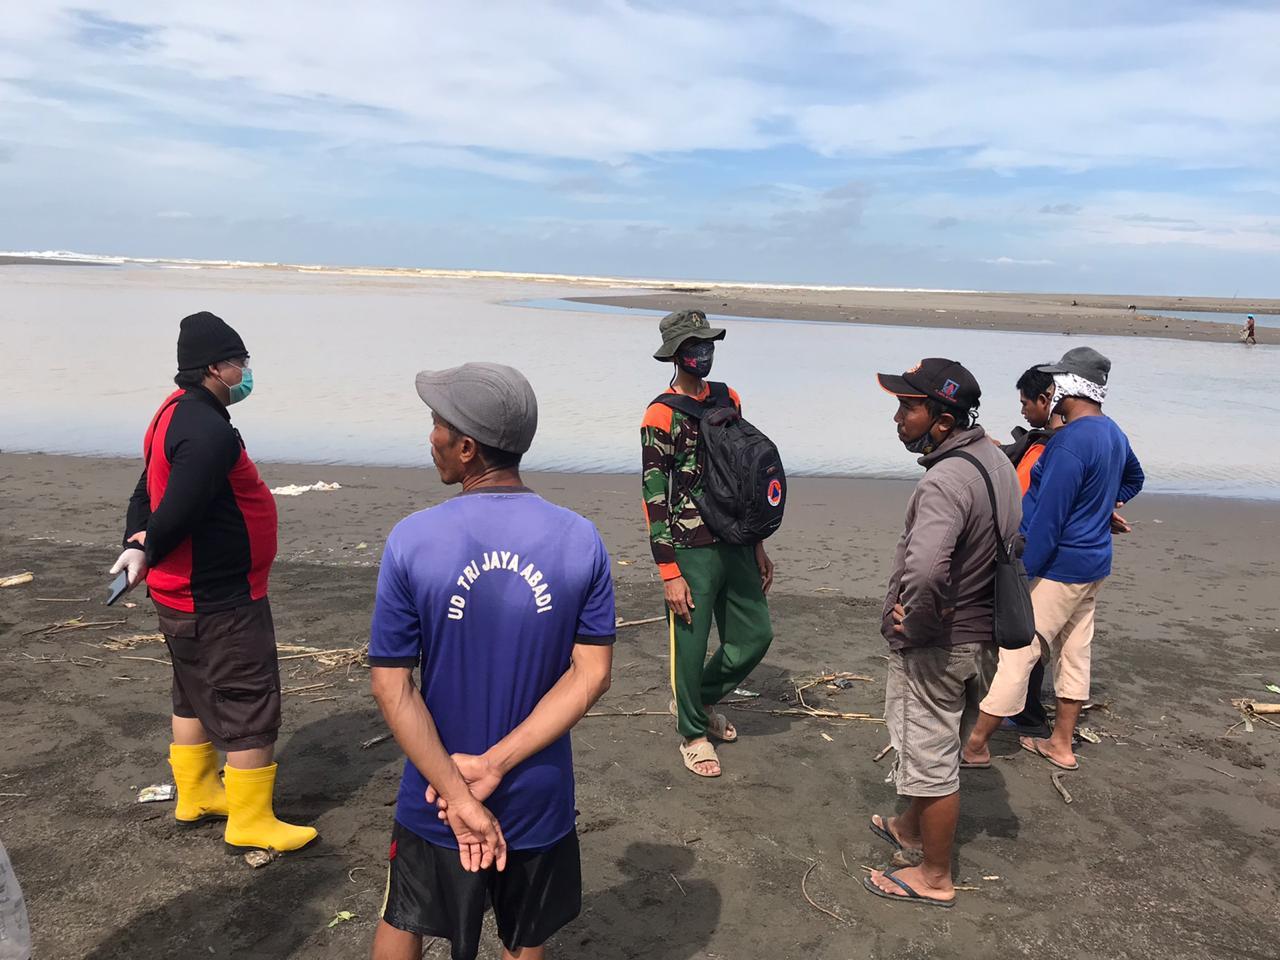 Berwisata, Dua Warga Dilaporkan Hilang di Muara Sungai Pantai Tegalretno